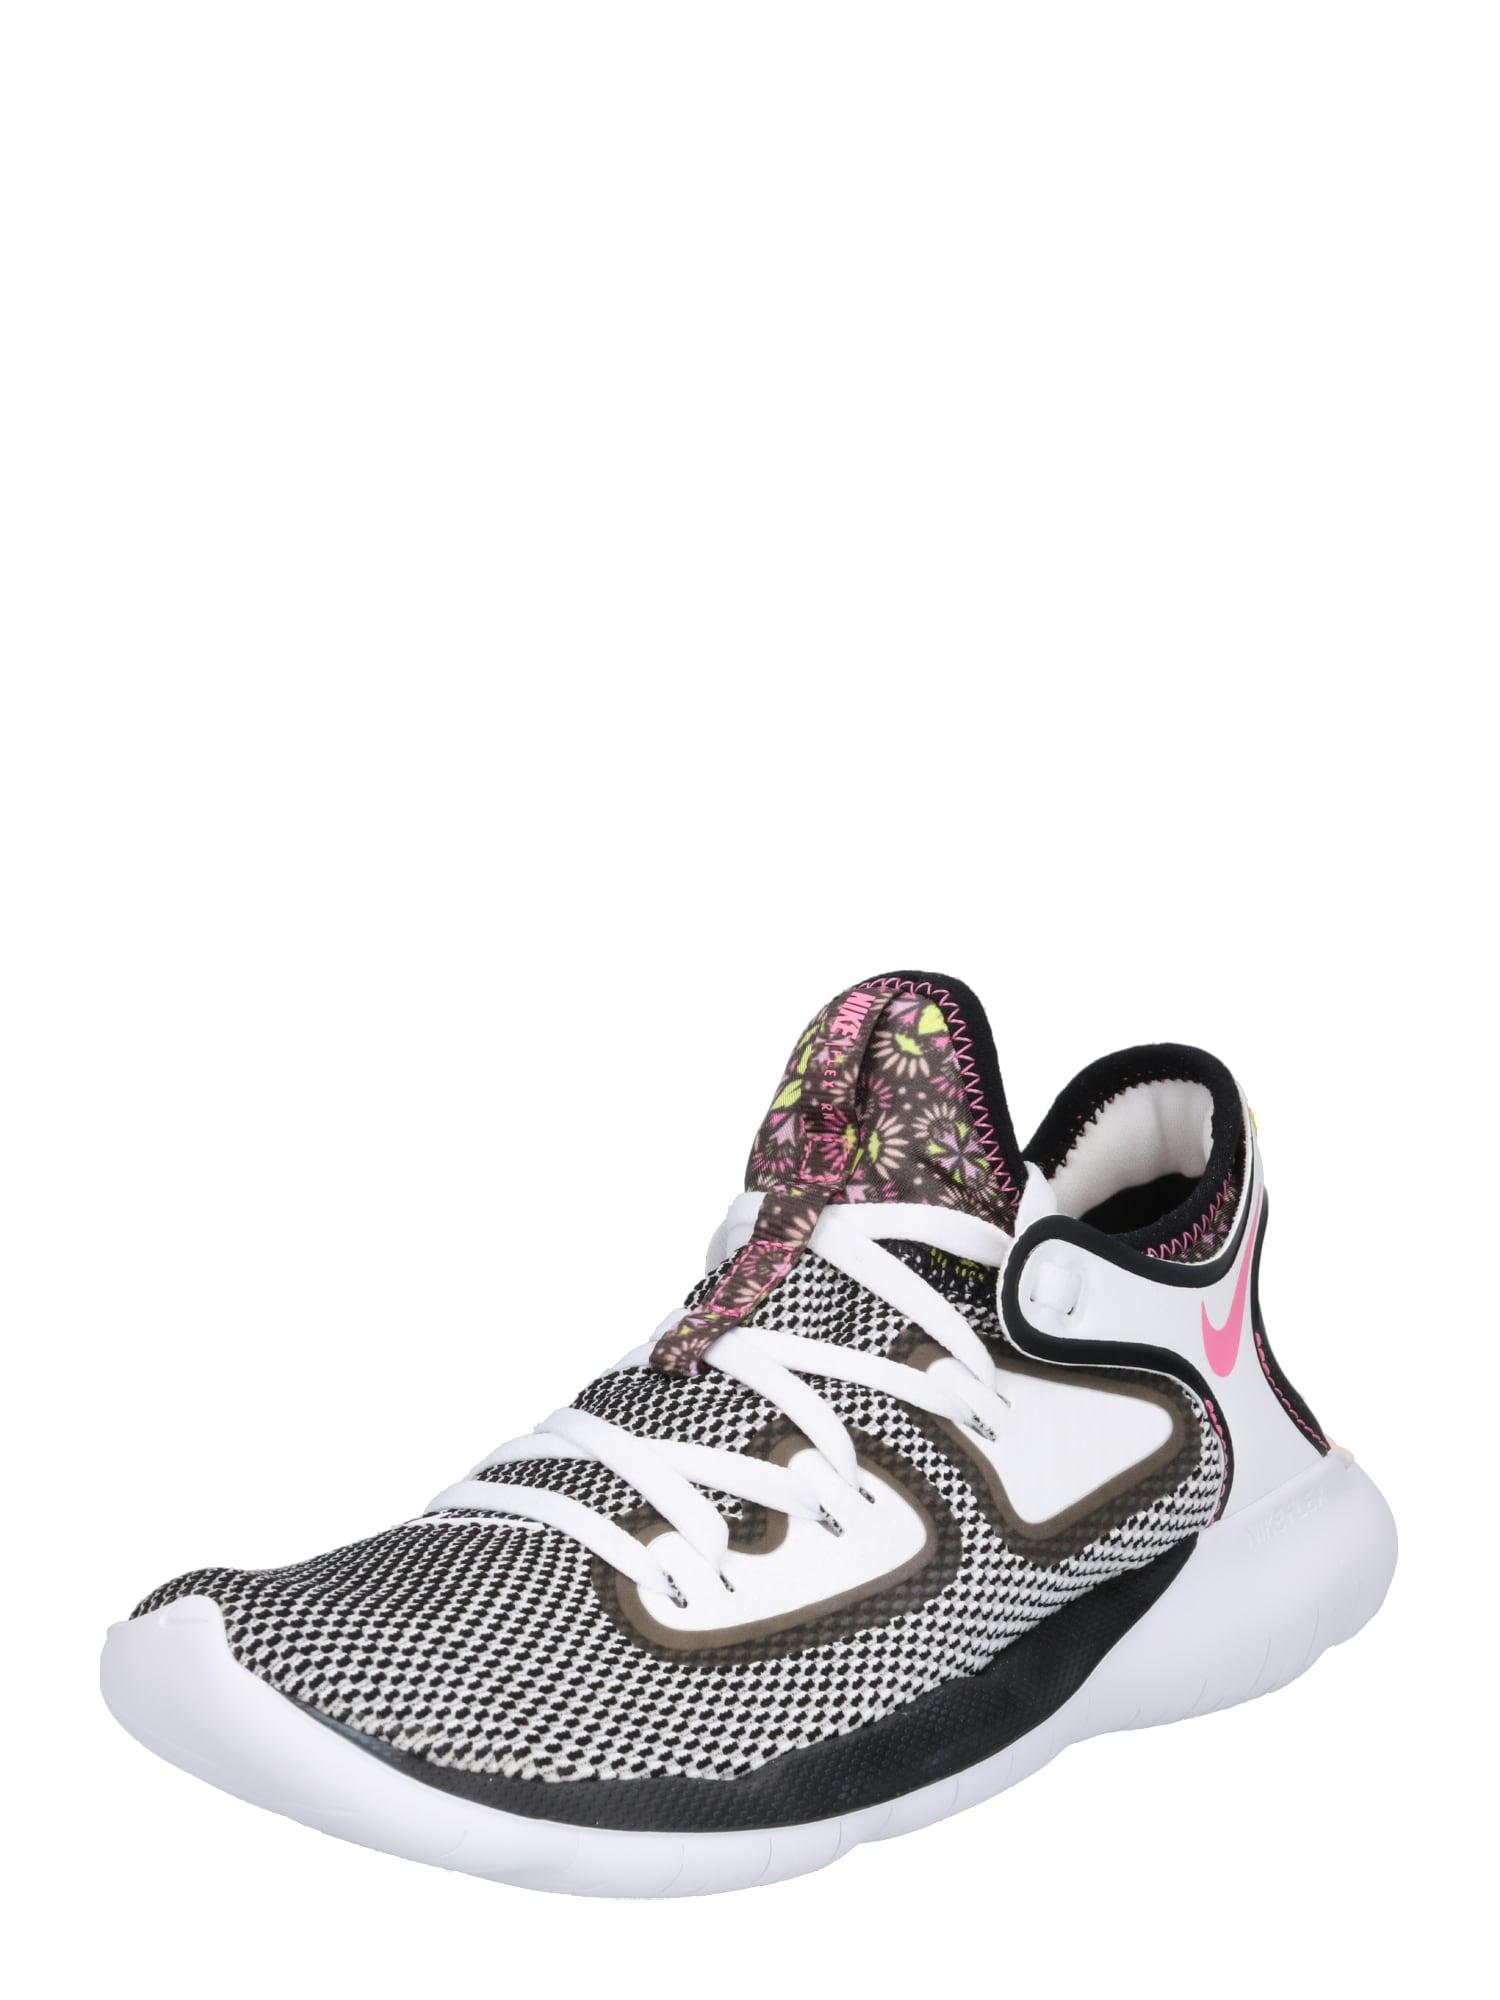 Sportovní boty FLEX šedá růžová bílá NIKE